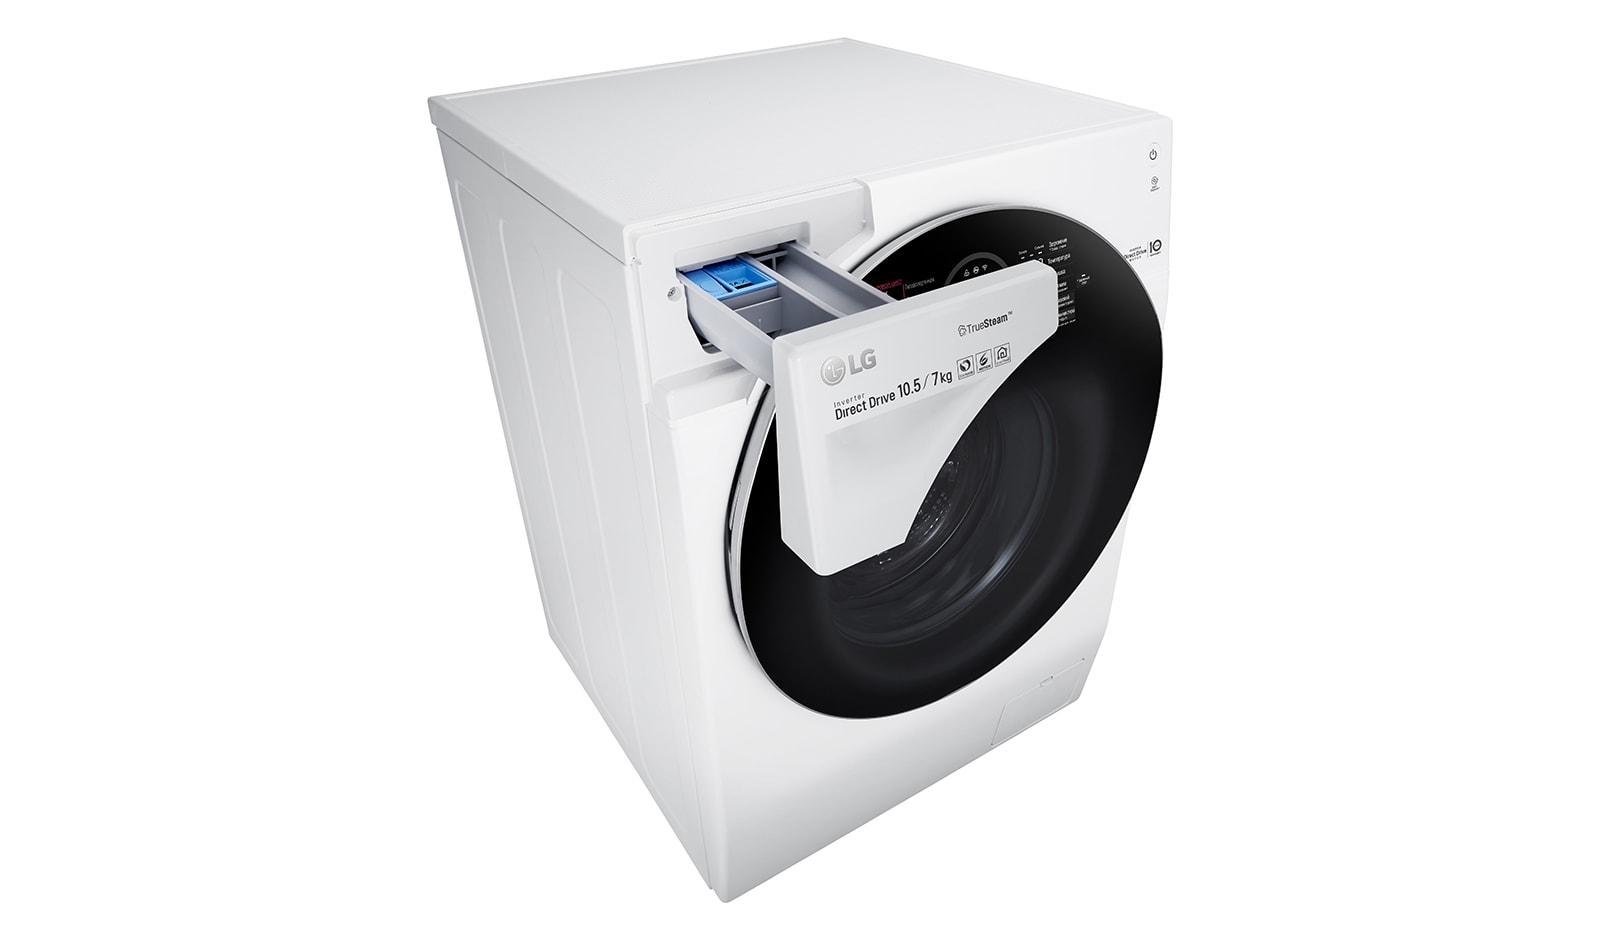 http://www.lg.com/ru/images/washing-machines/md05904556/gallery/large_09.jpg